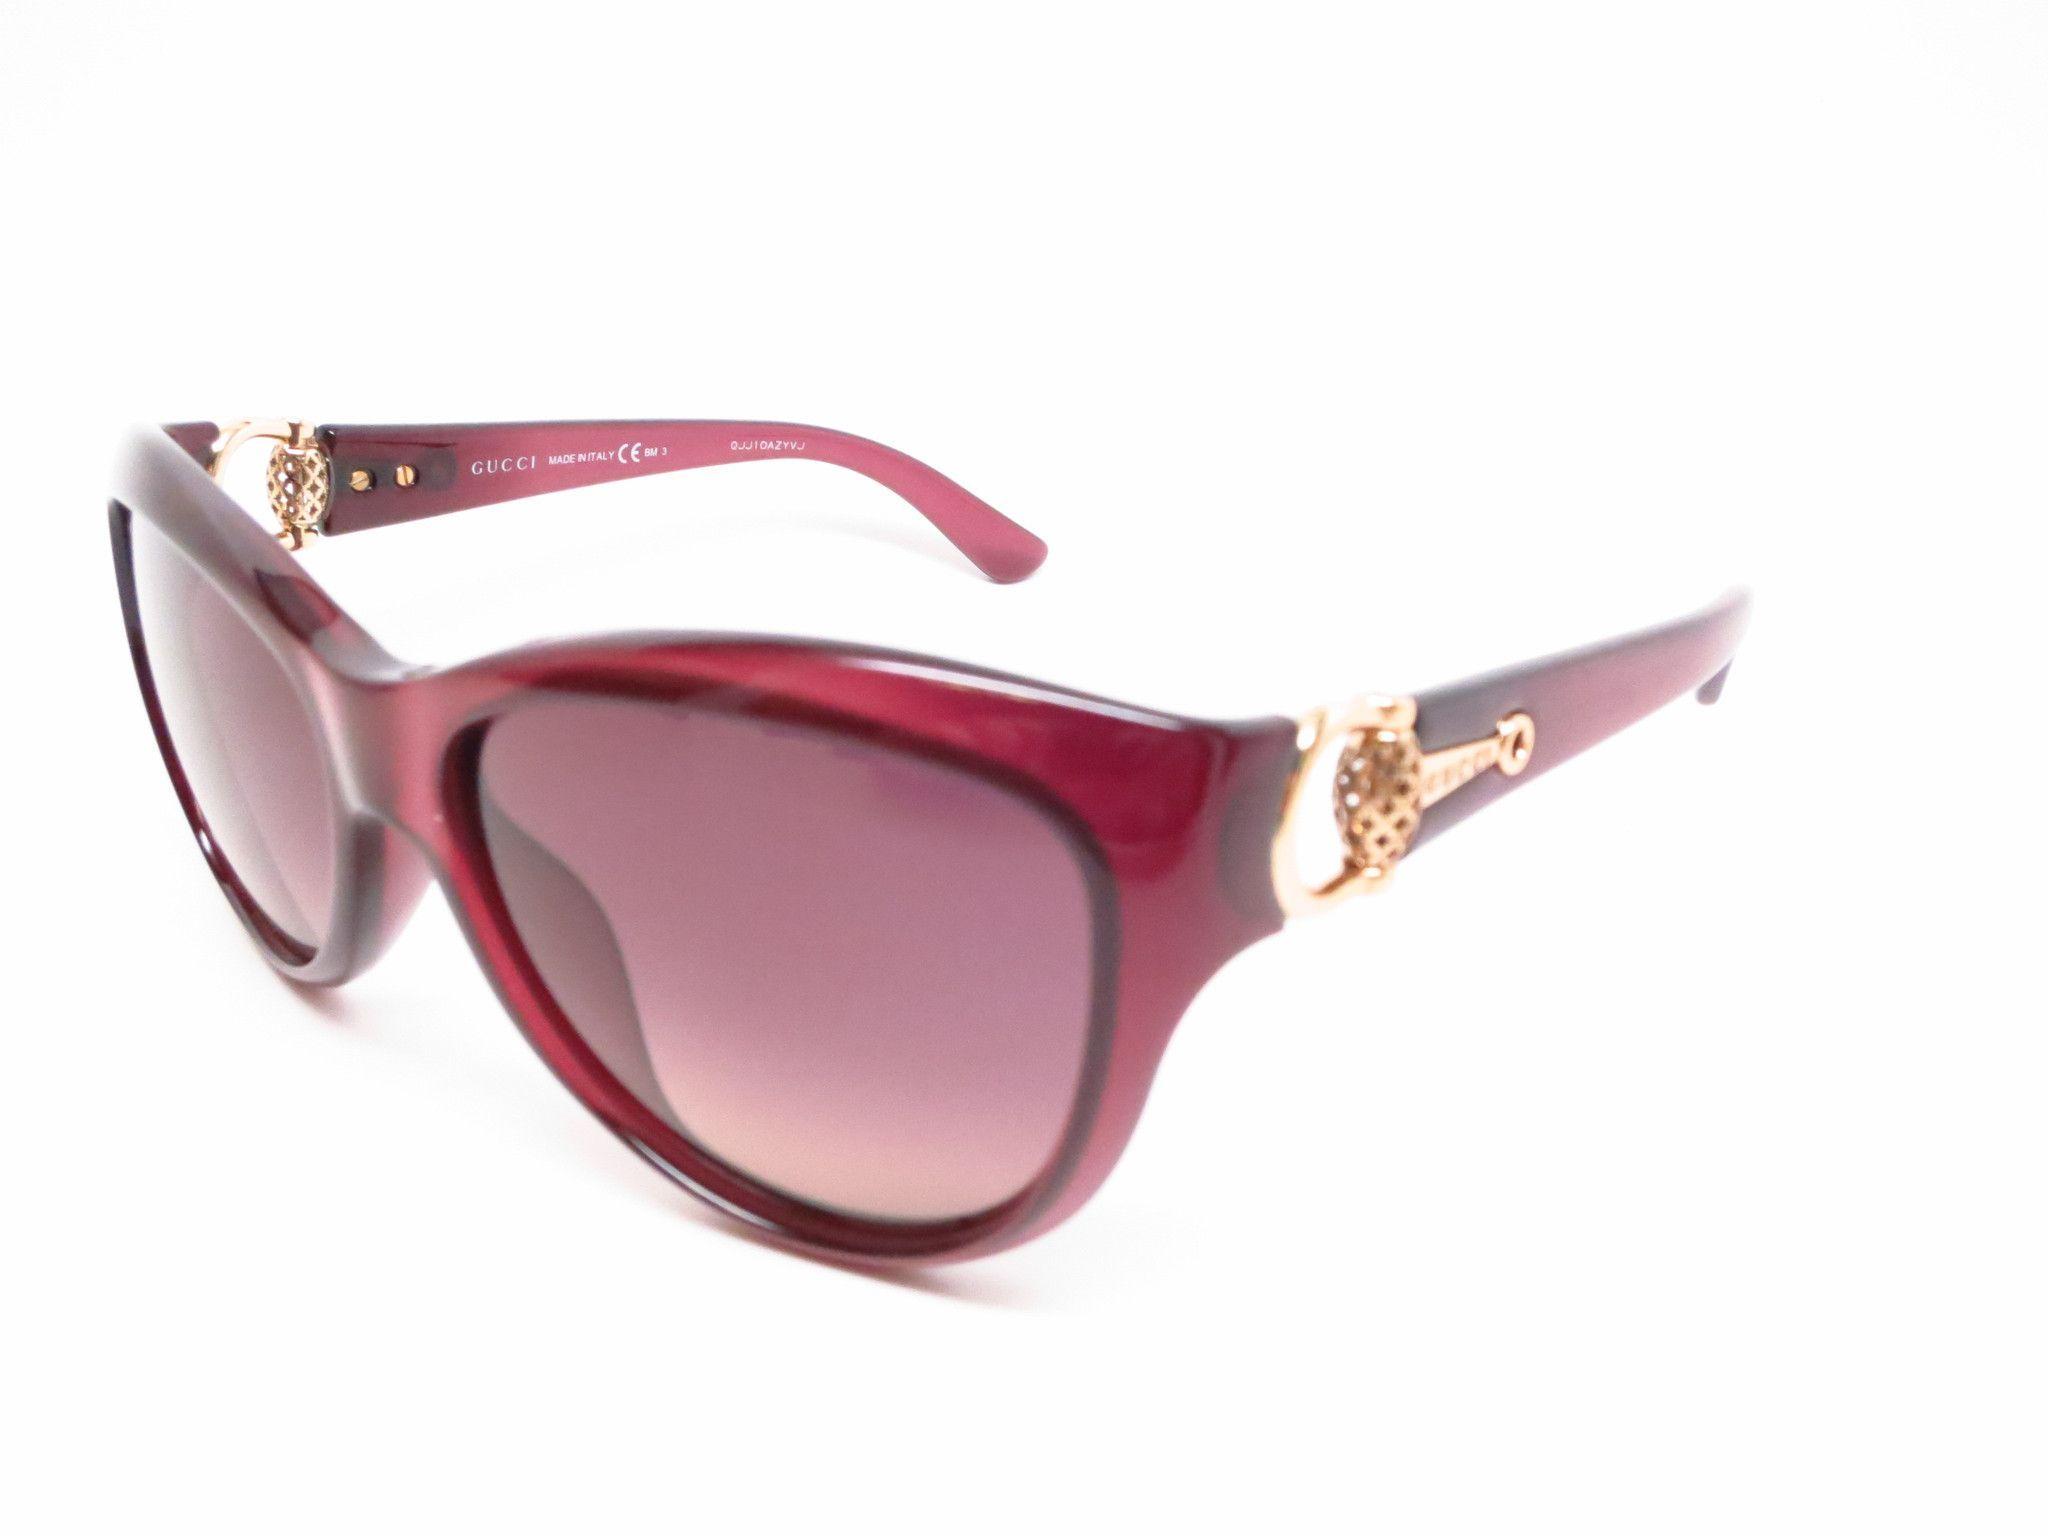 88fca223c8 Gucci GG 3711 S 0D0R4 Burgundy Sunglasses